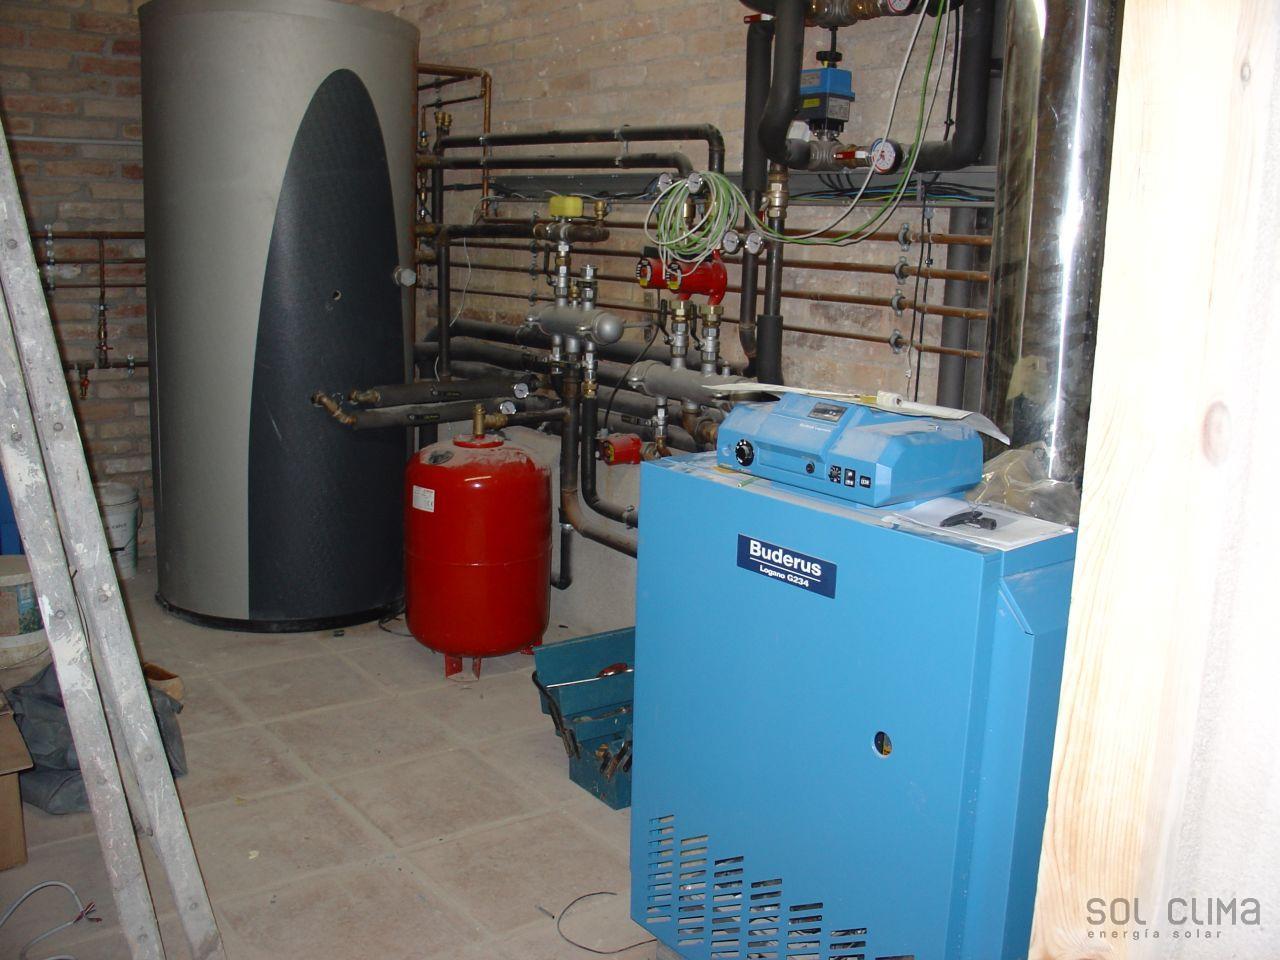 High performance boiler